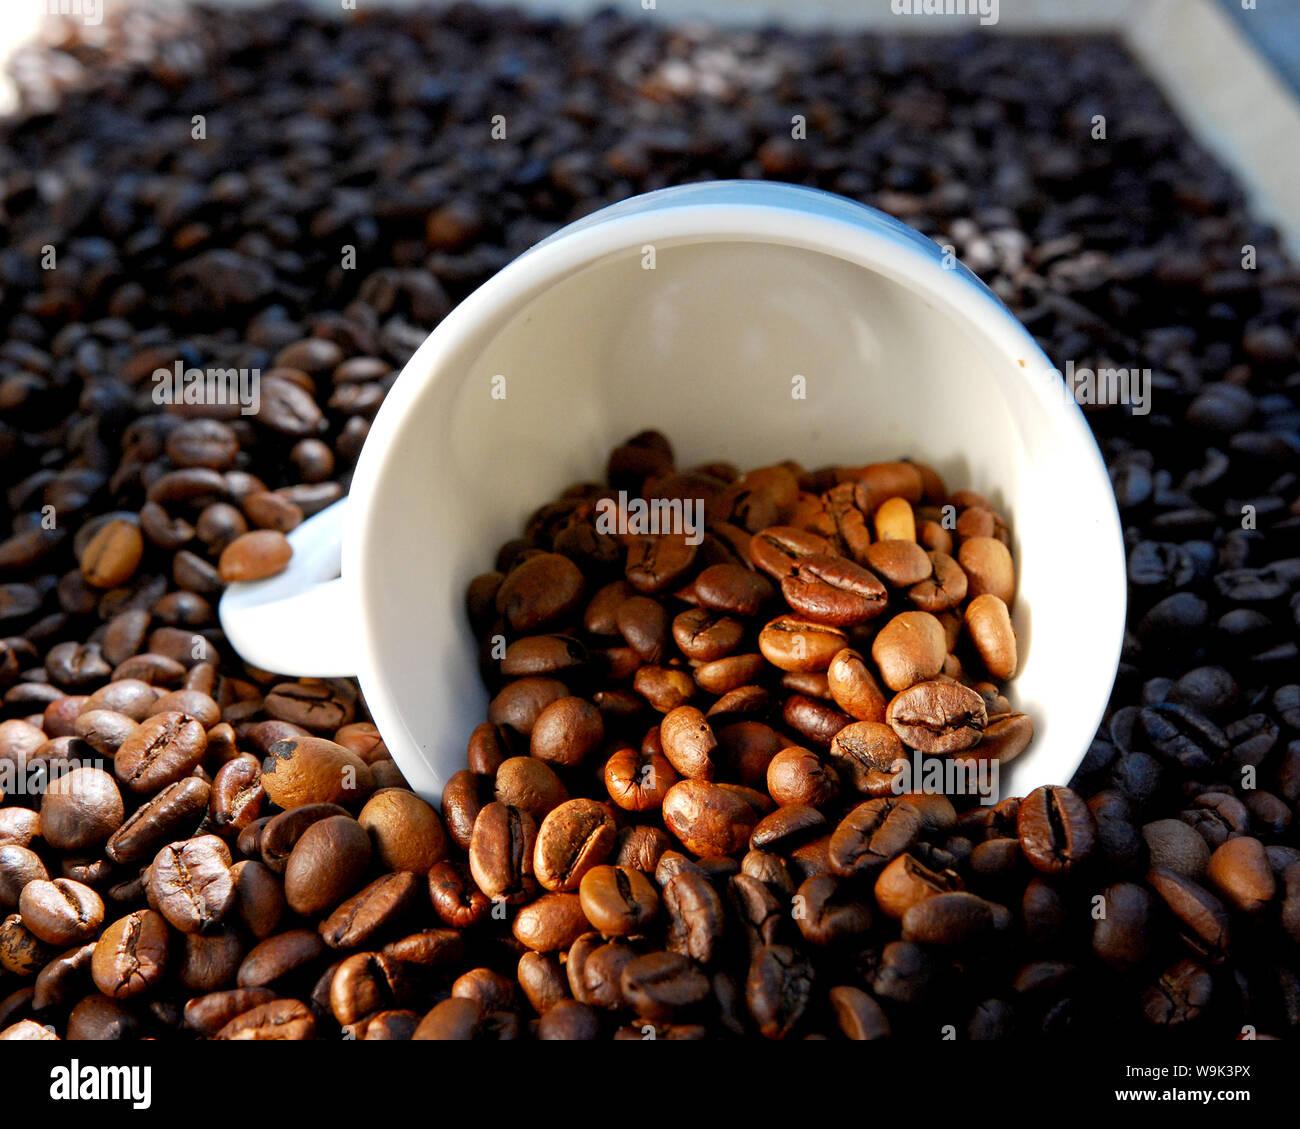 Chicchi di caffè tostati immagine di un Foto Stock